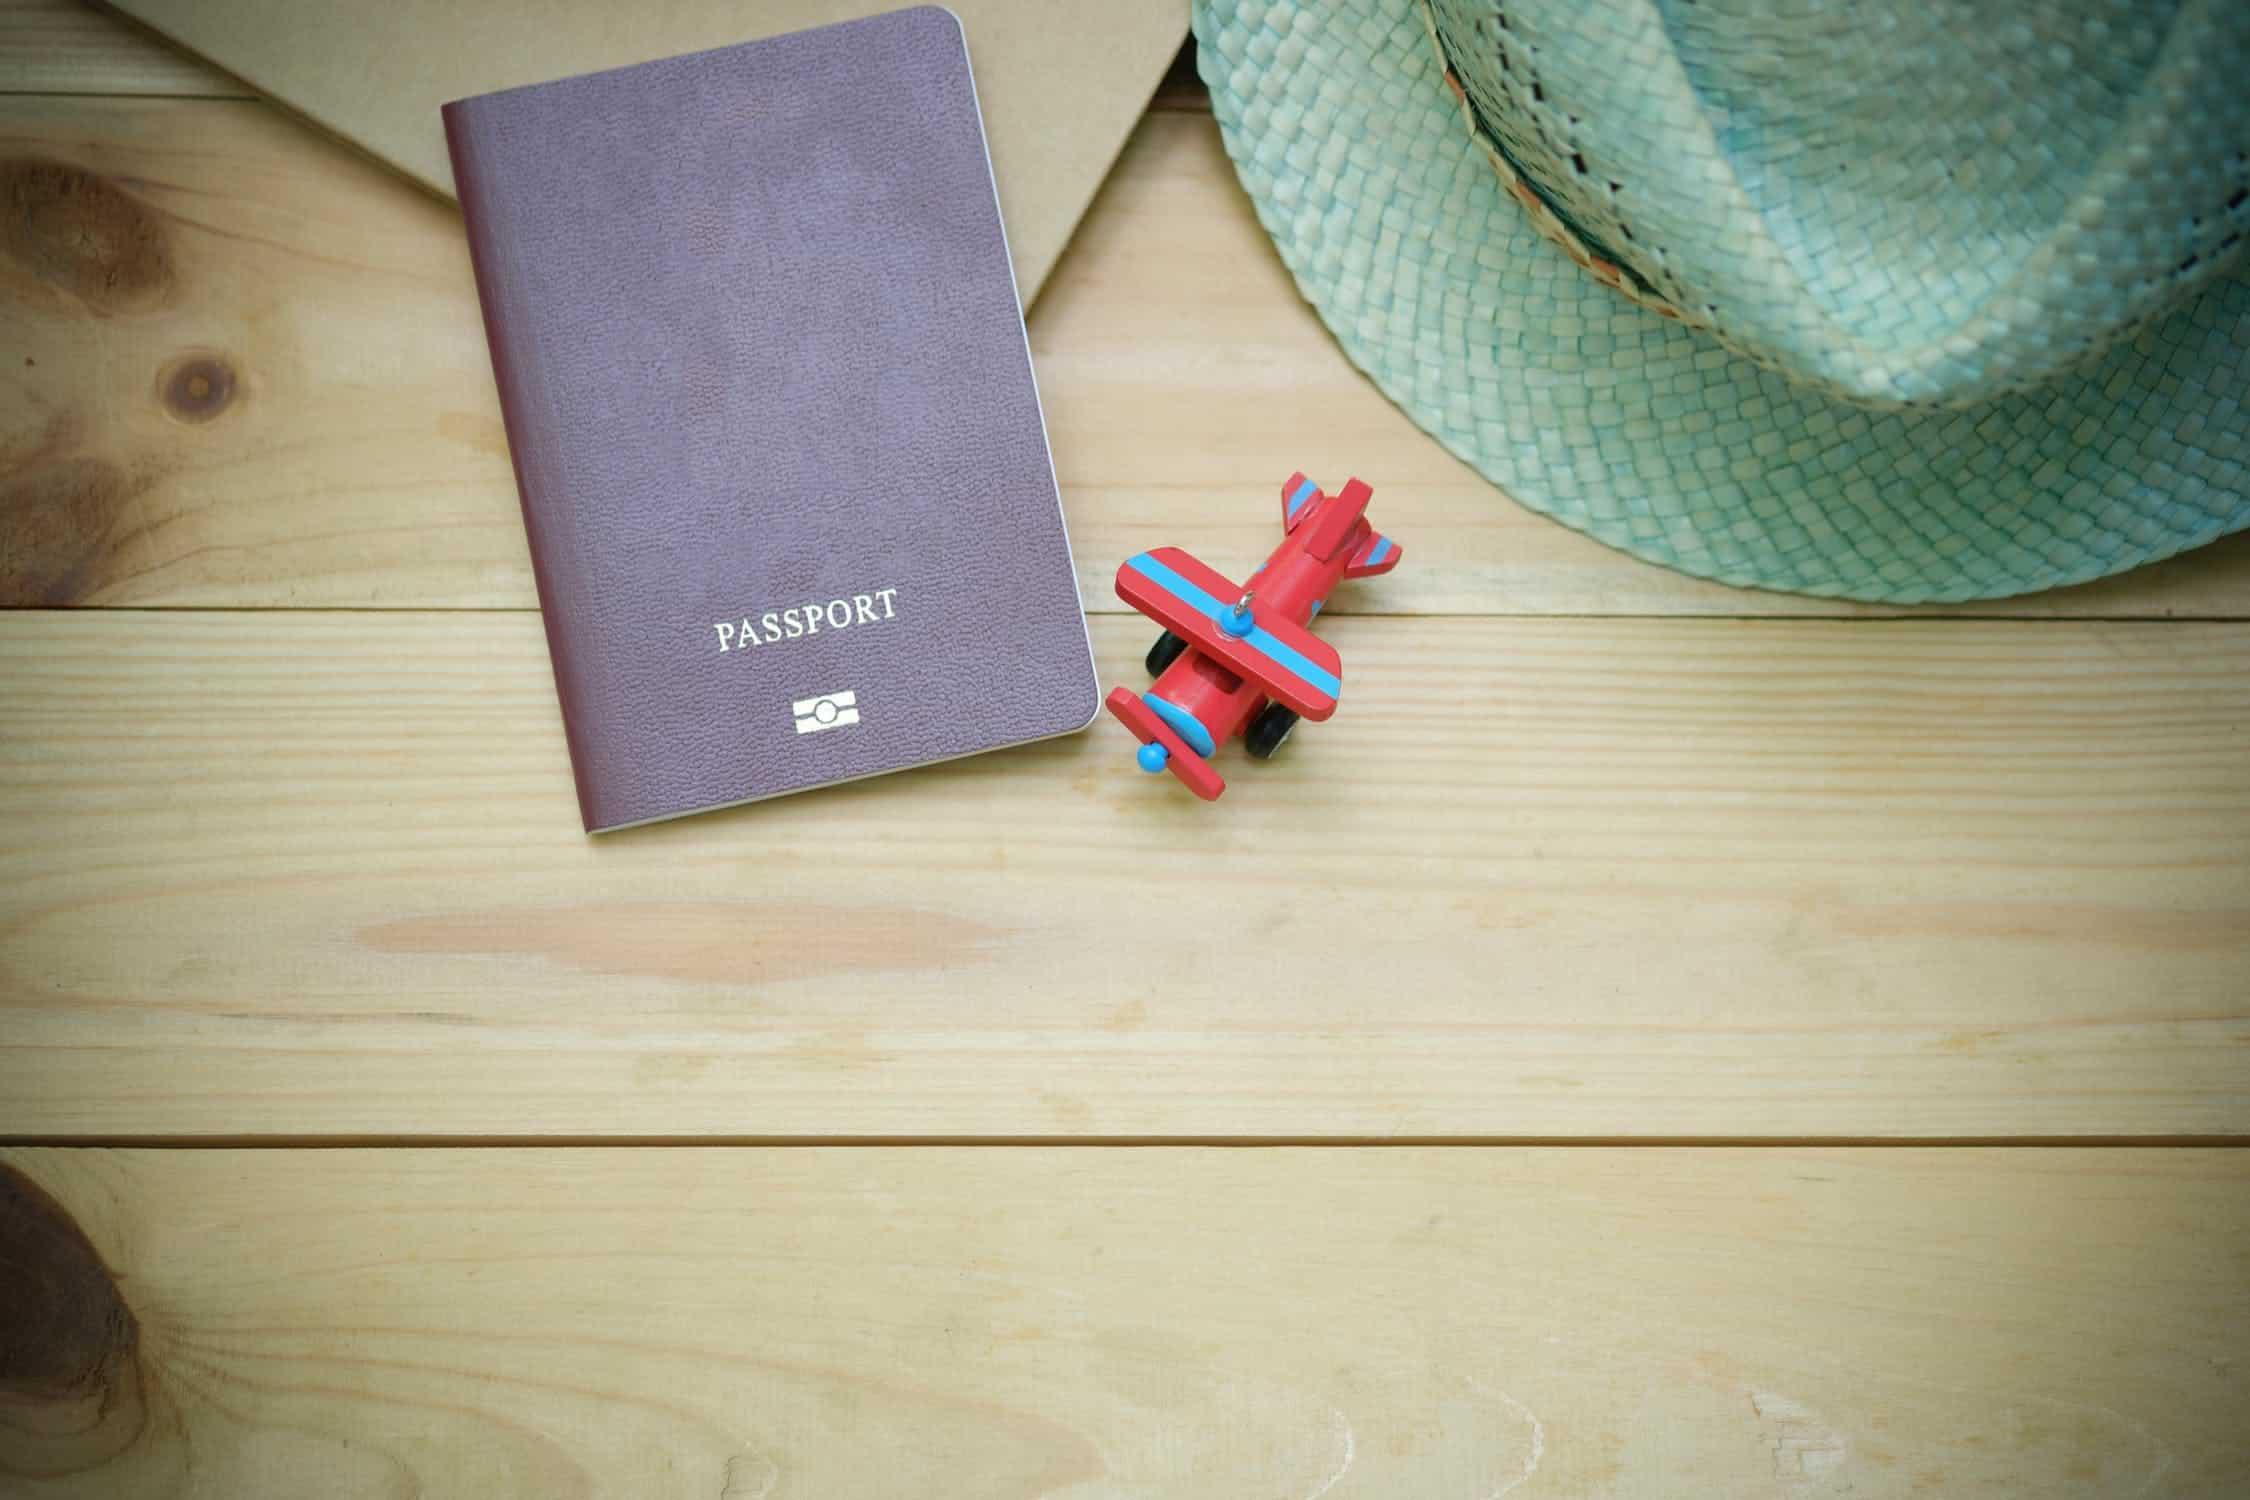 Passport - Travel Must-haves for International Travel